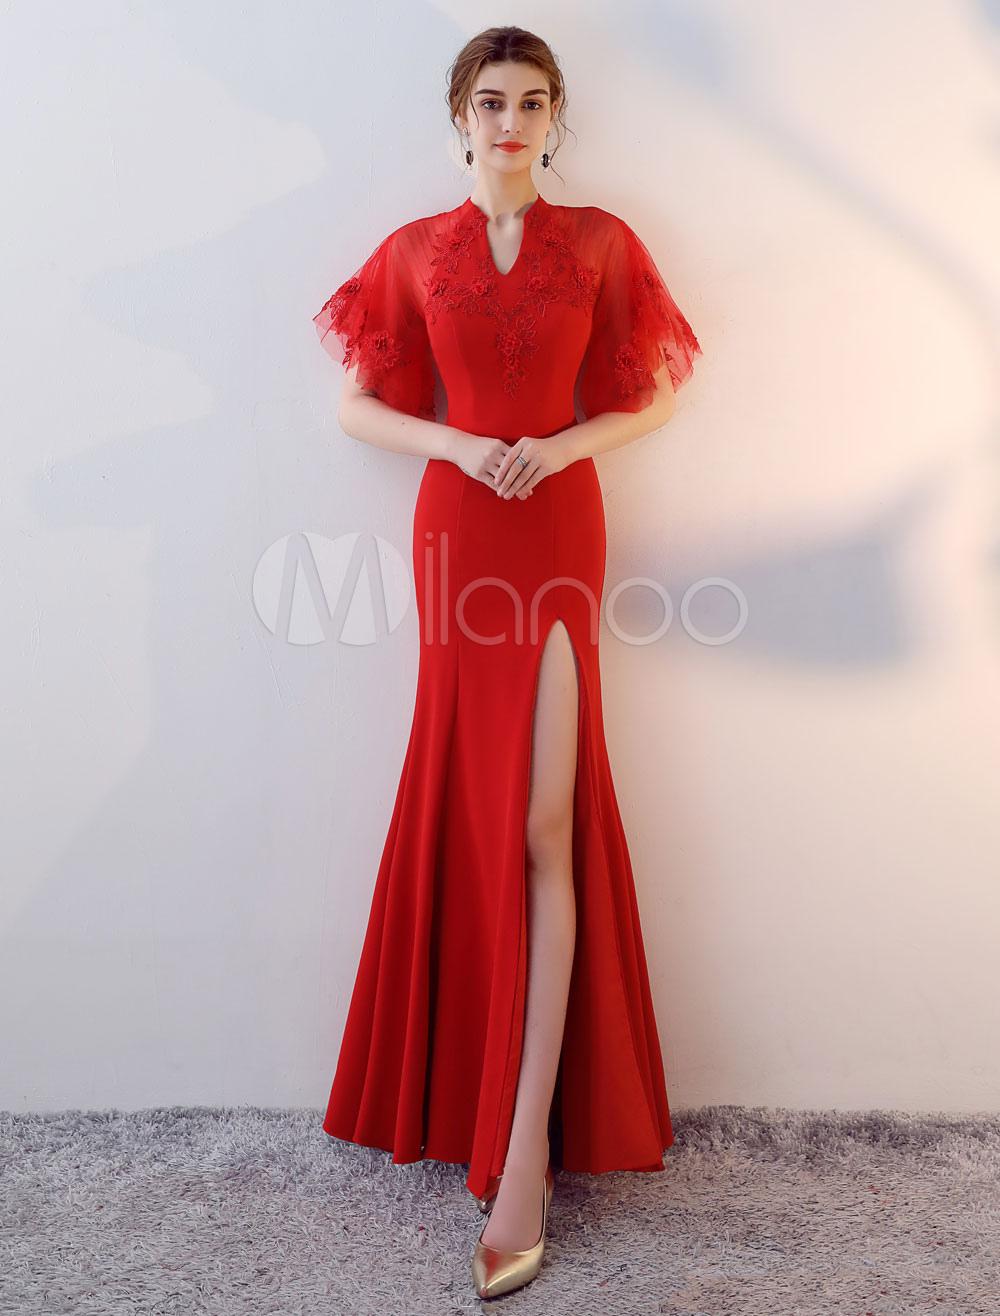 Red Evening Dresses Sexy High Split Formal Dress V Neck Short Sleeve Satin Occasion Dress (Wedding) photo